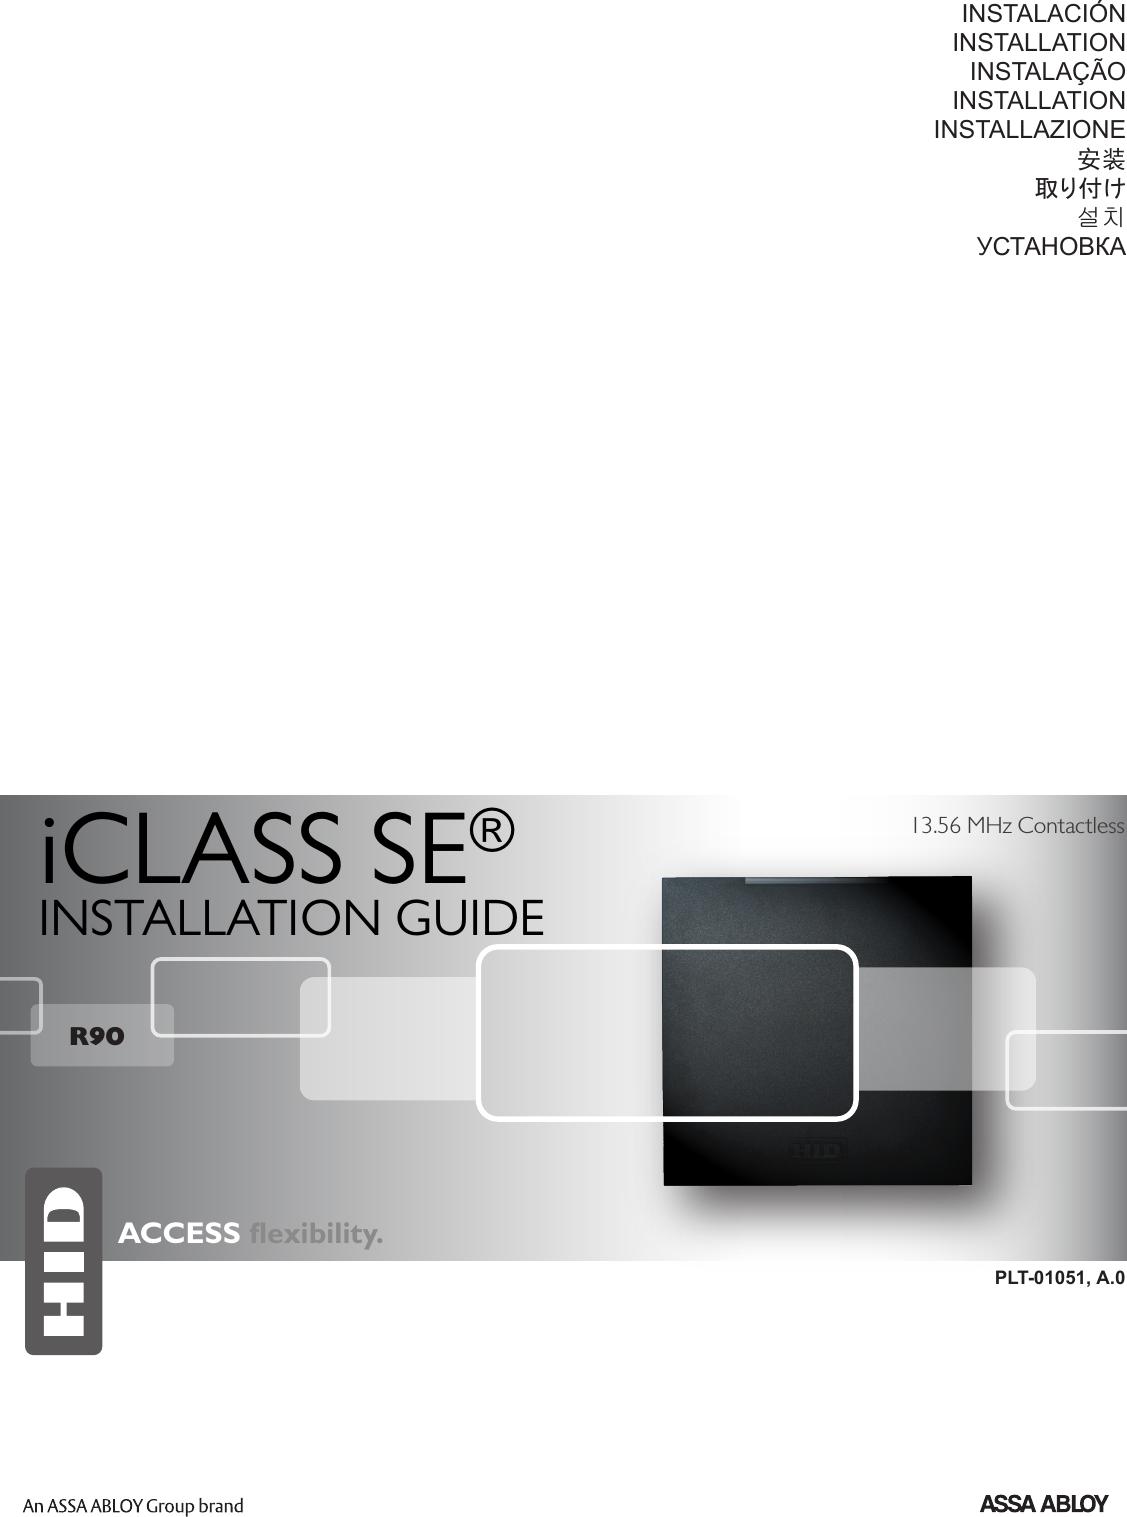 Hid Iclass Se Reader Wiring Diagram Best Wallpapers Cloud Access Global Iclassr90e R90 User Manual Dfm Rev C Universal Installation Guide